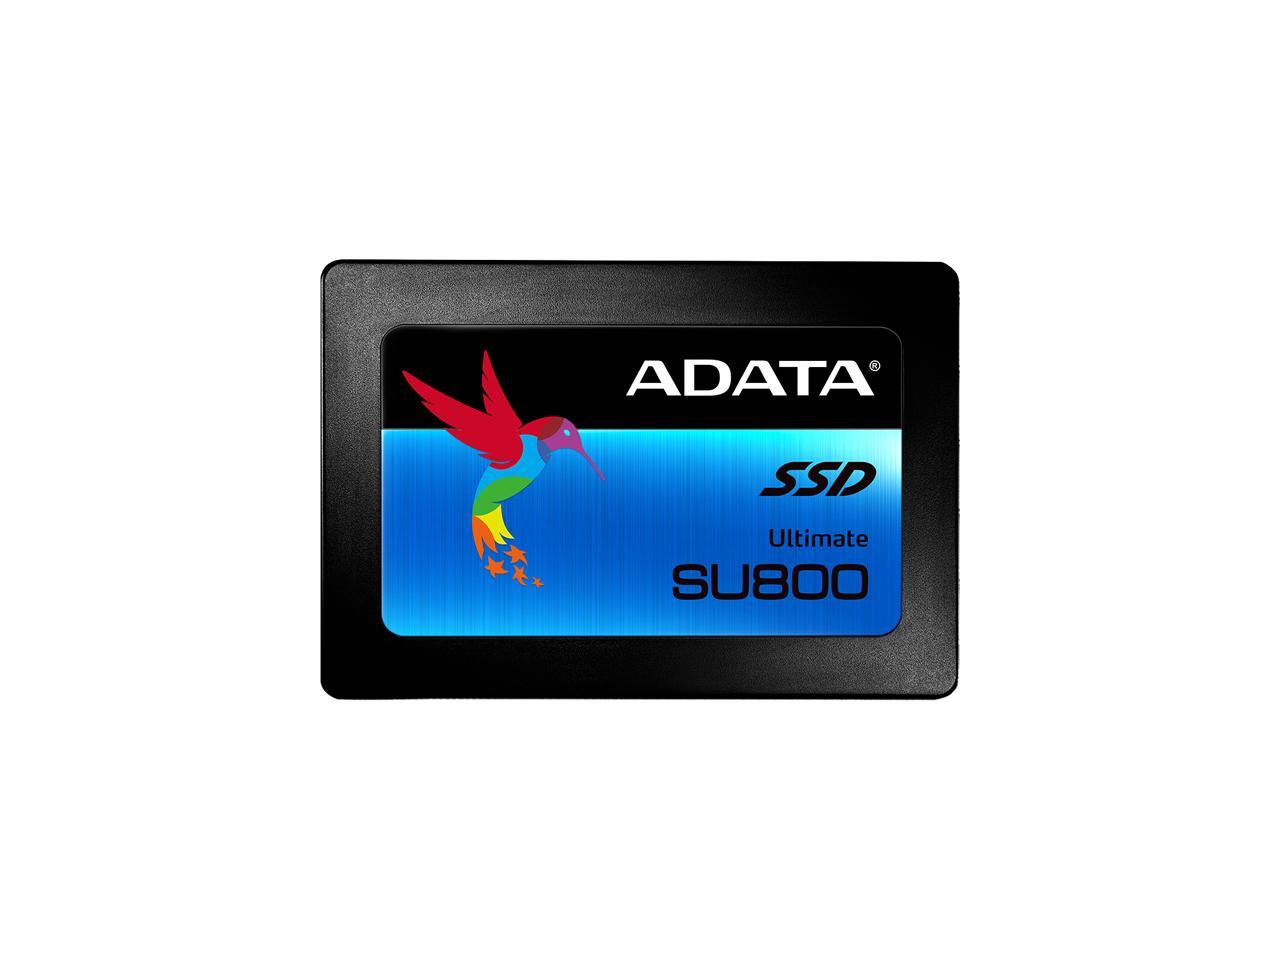 ADATA Ultimate SU800 128GB 3D NAND 2.5 Inch SSD (+$10GC) $50@Newegg